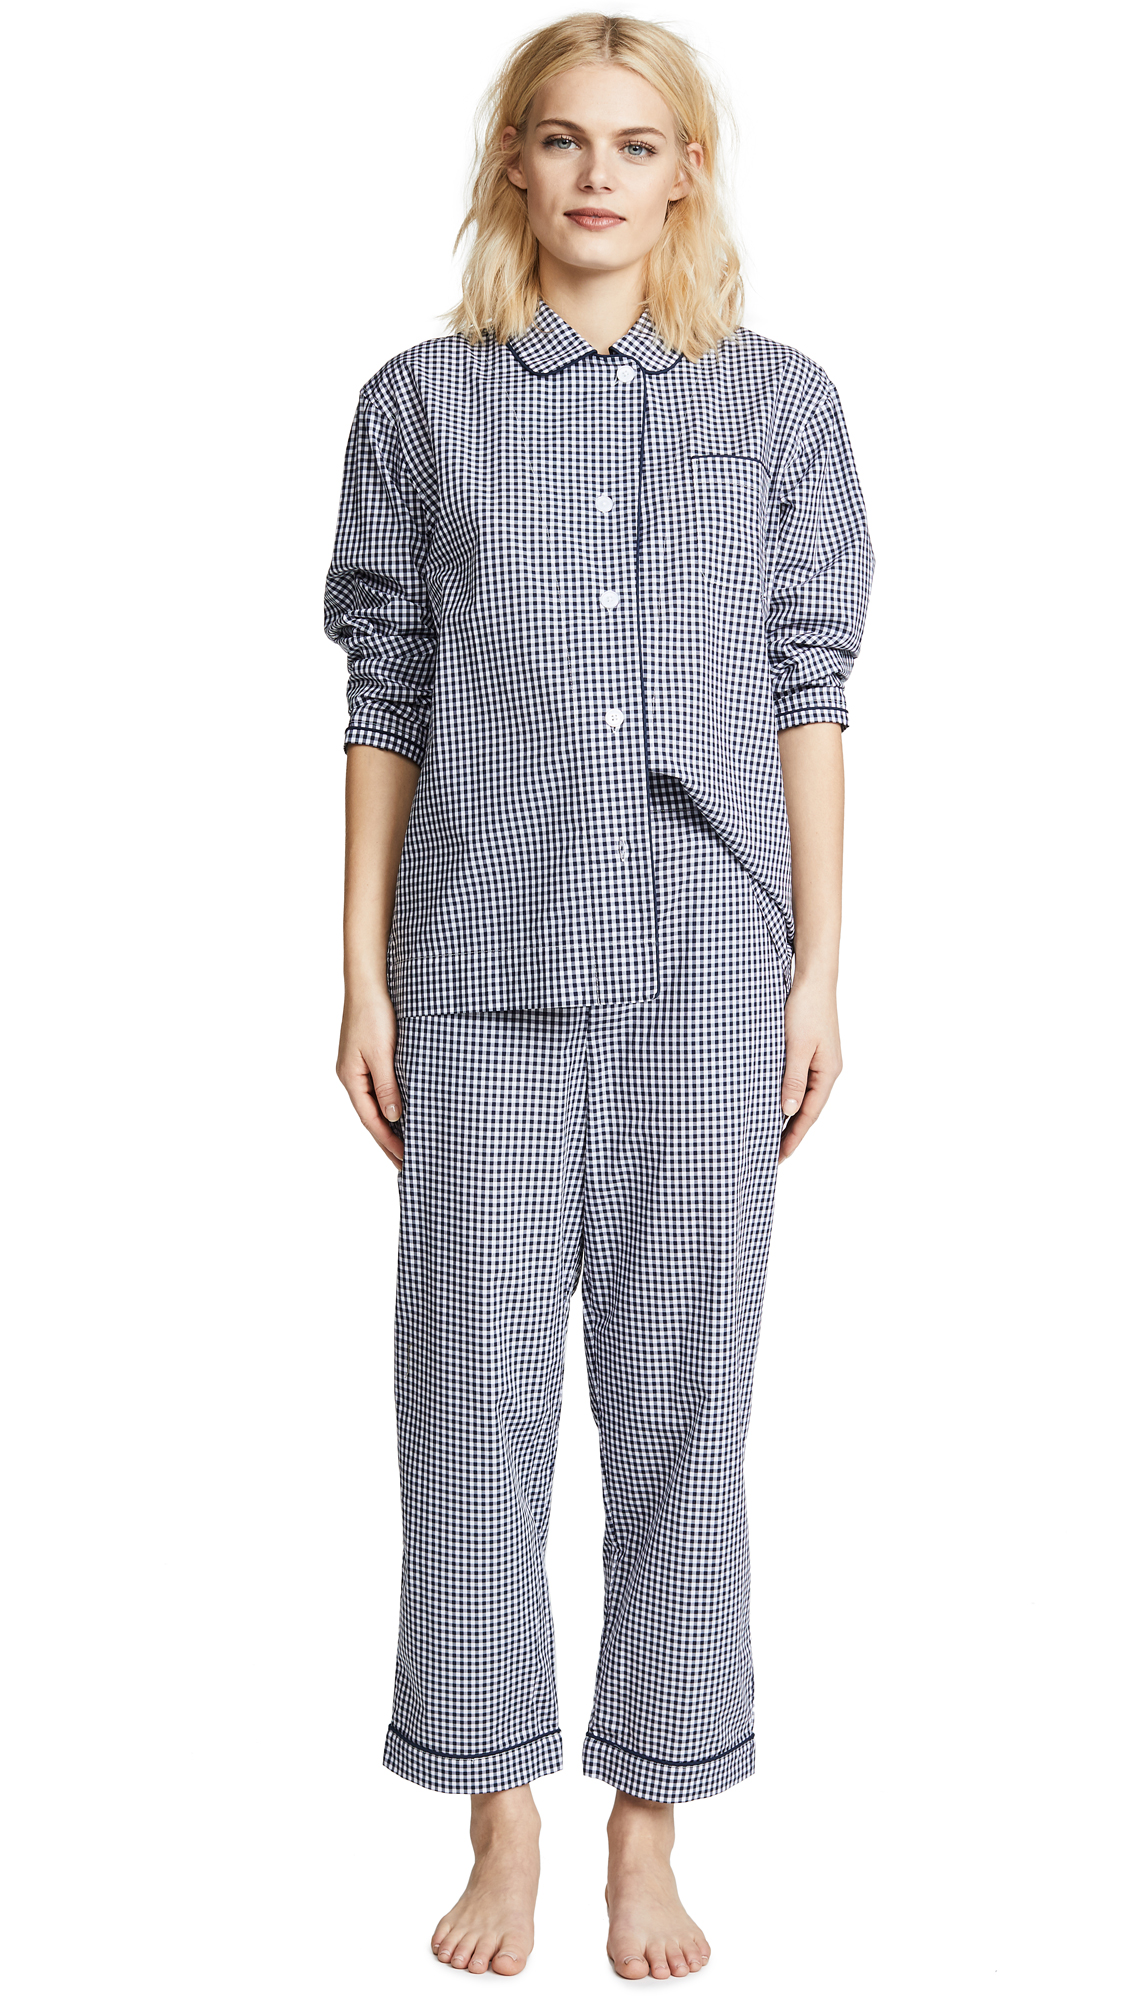 Sleepy Jones Large Gingham Bishop Pajama Set